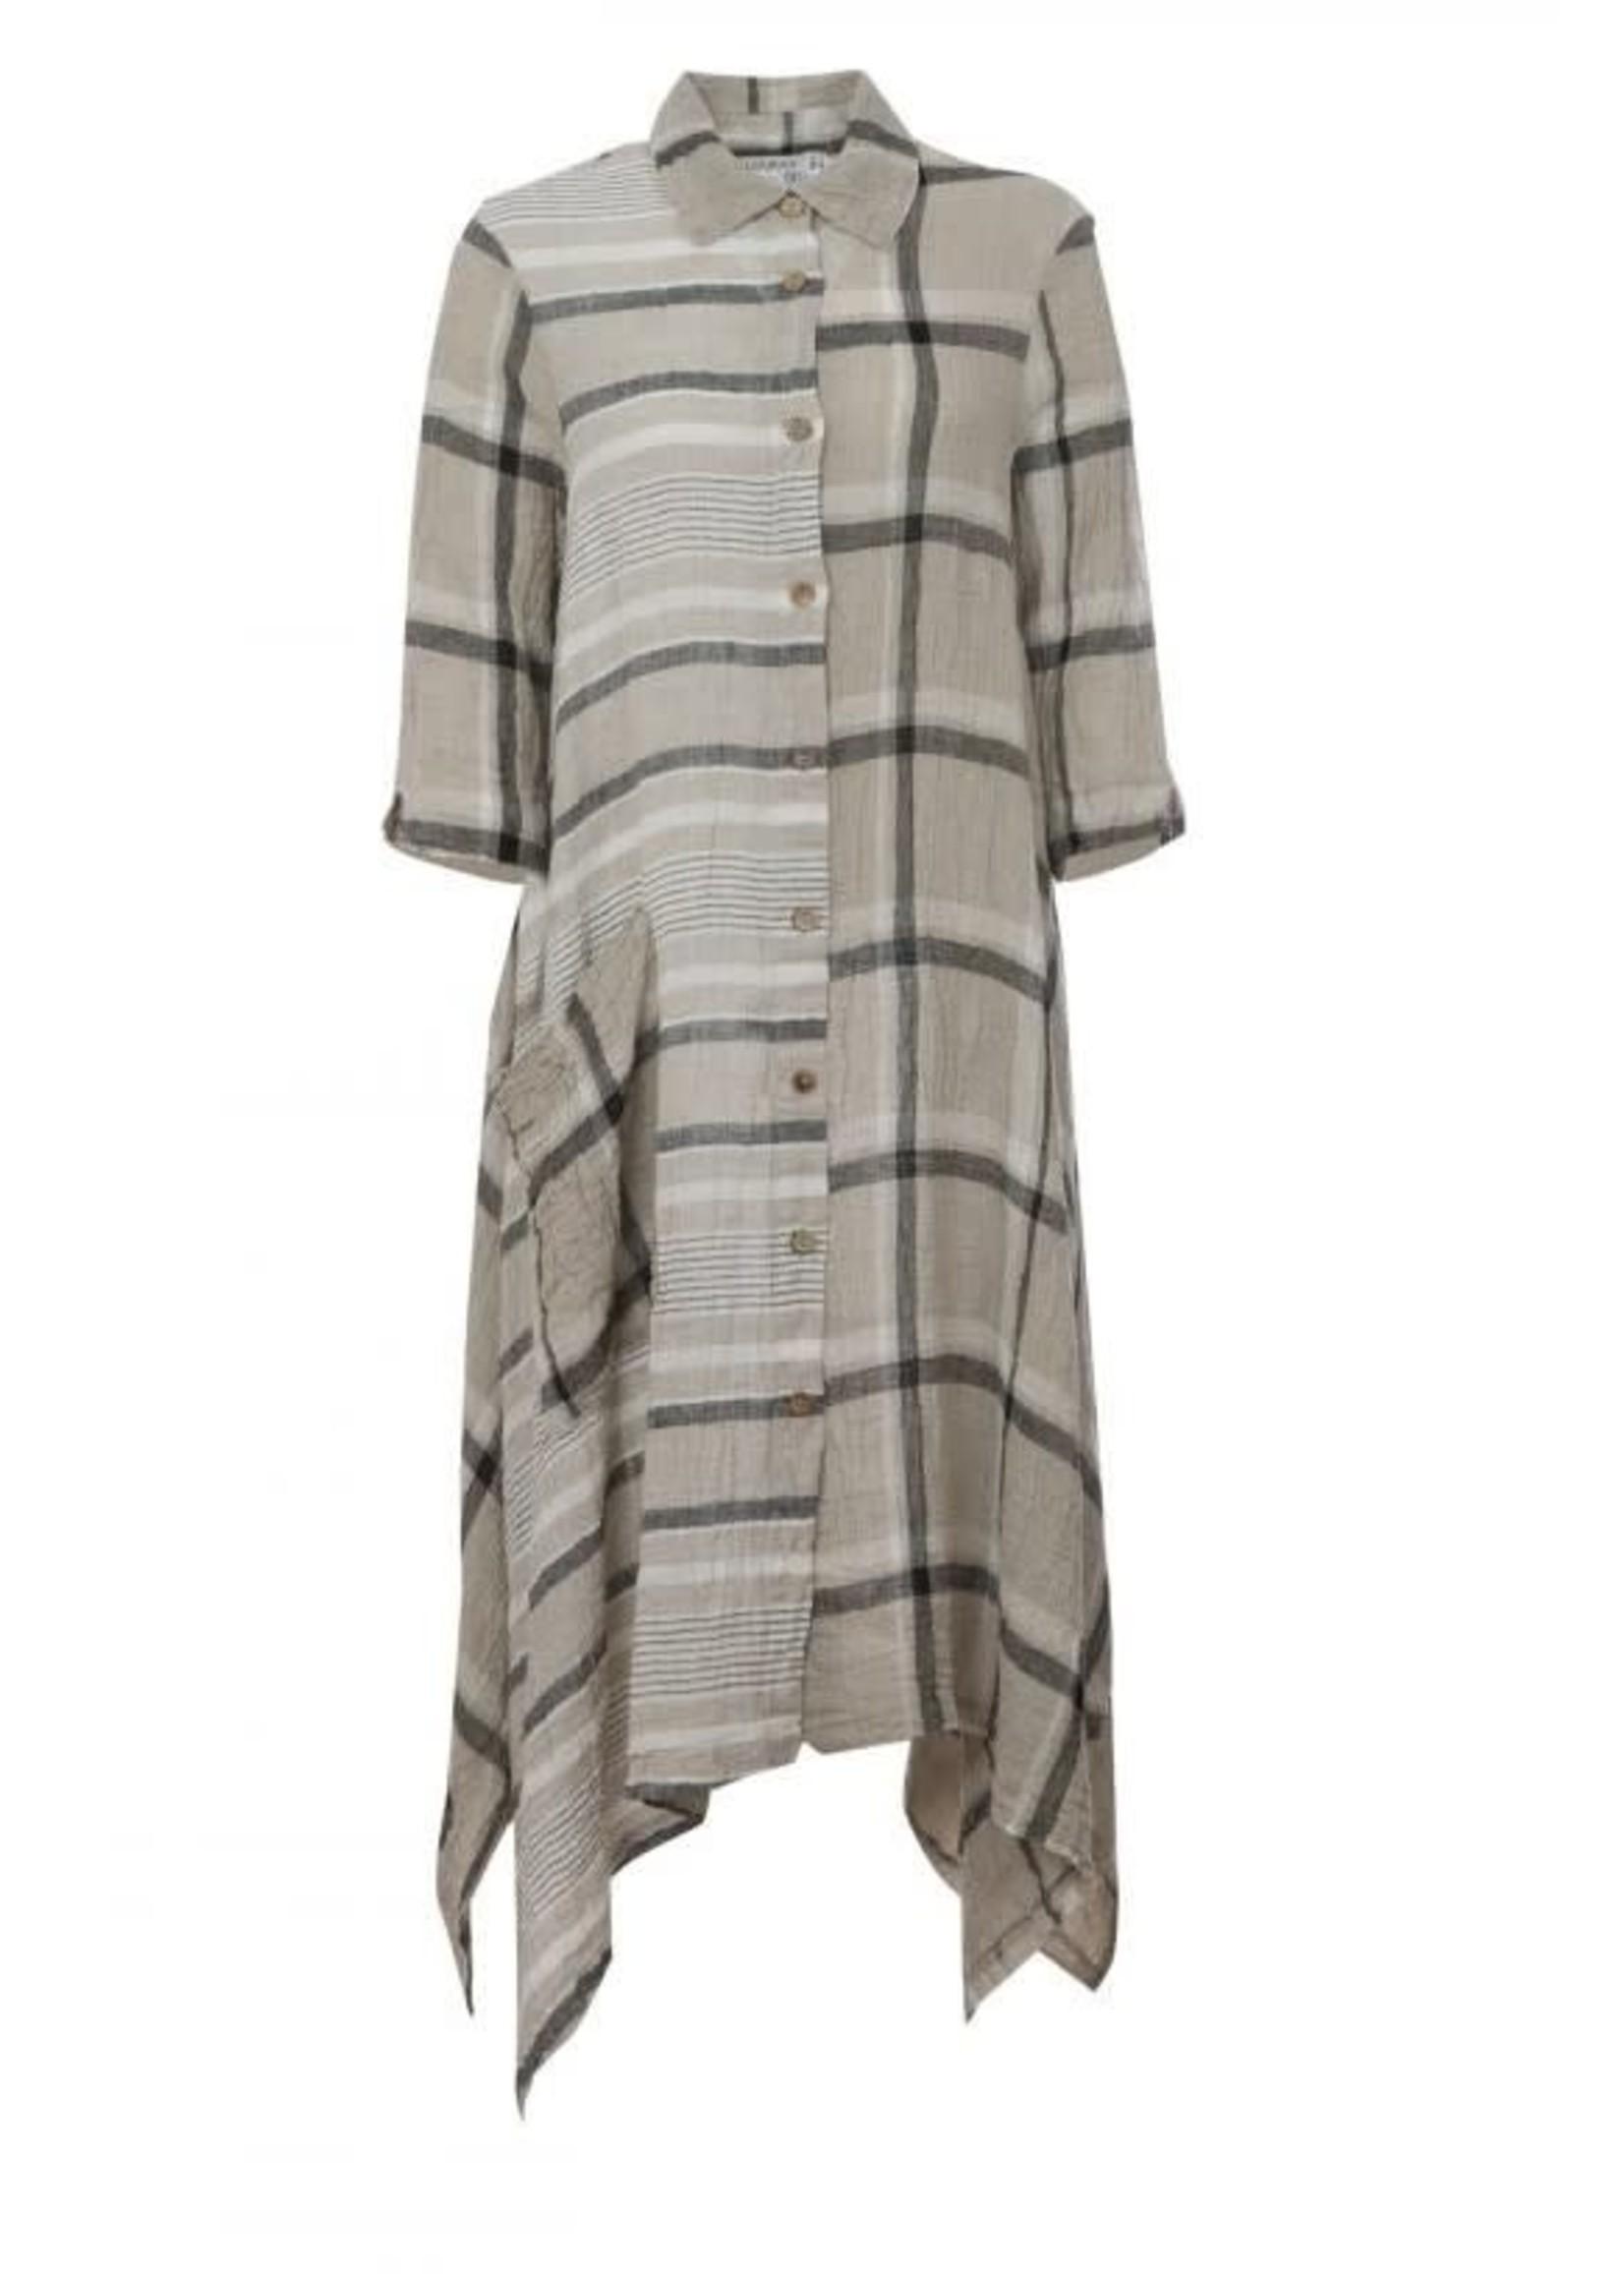 LUUKAA 20y528 striped checkerd dress